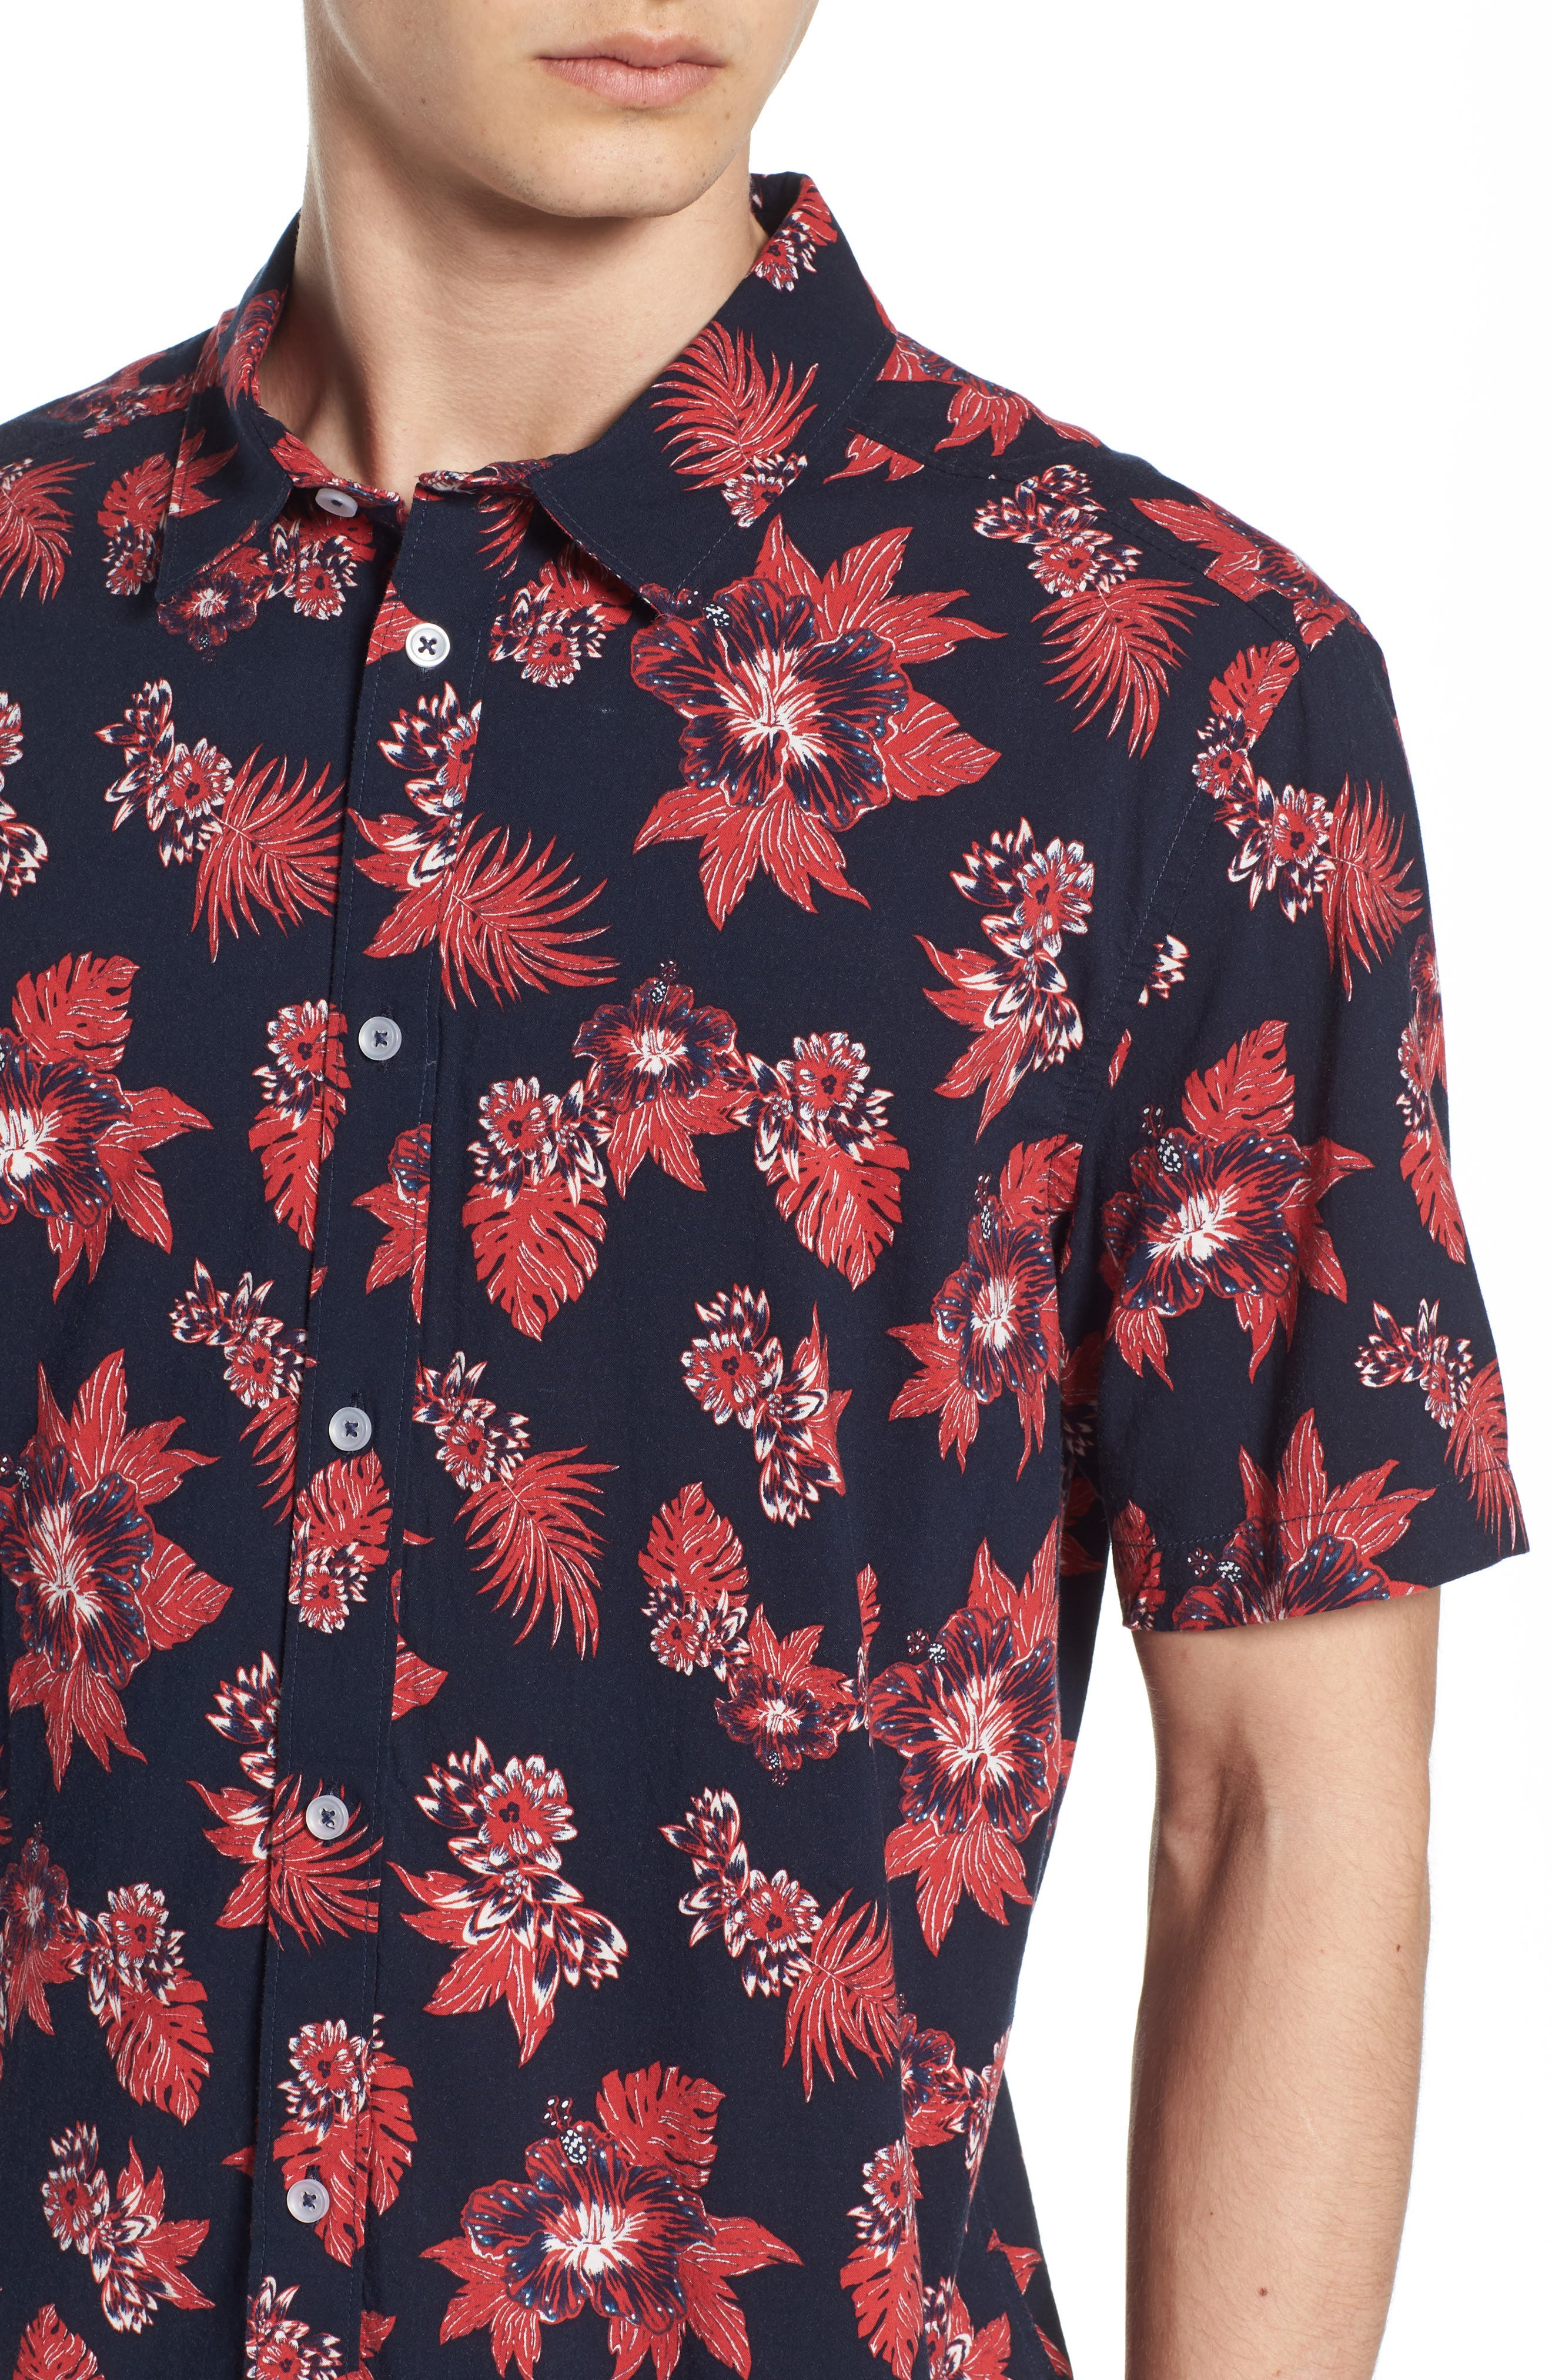 McMillian Woven Shirt,                             Alternate thumbnail 4, color,                             402